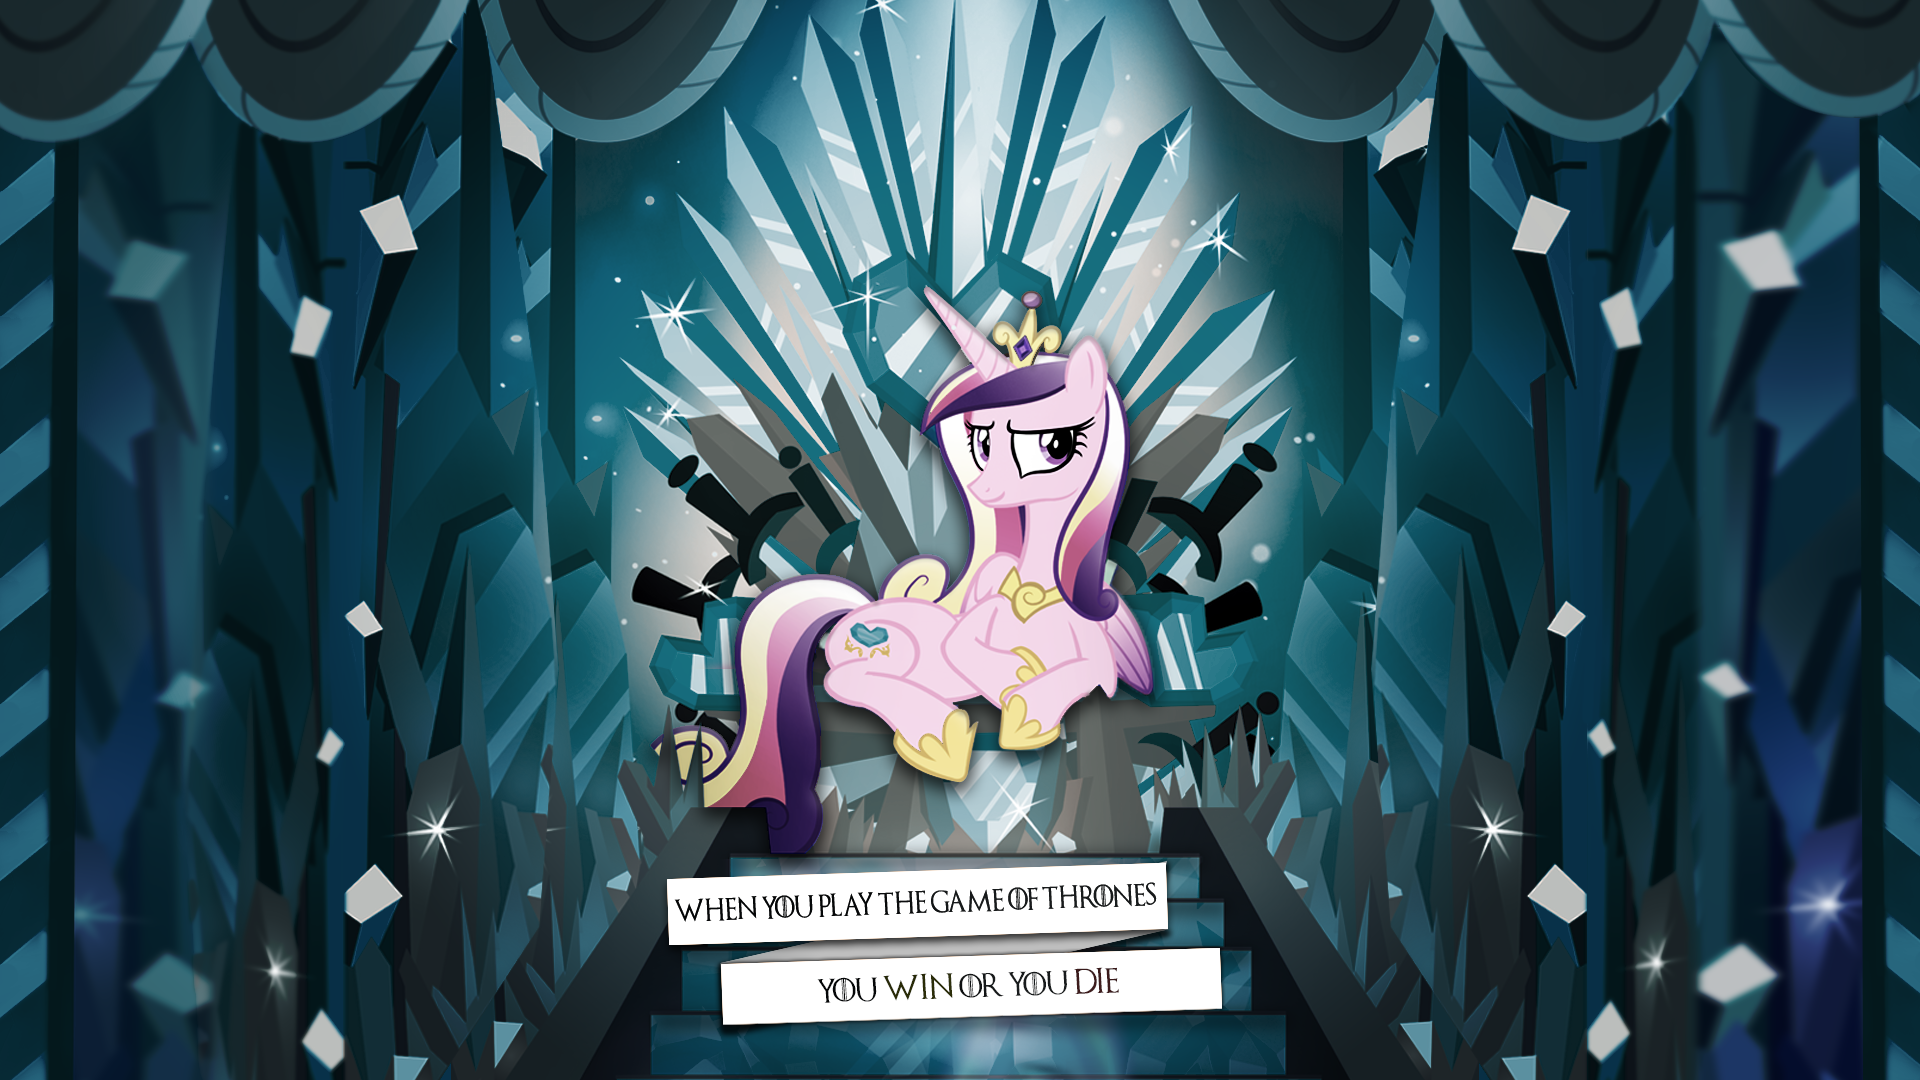 I Won. by PixelKitties and Rainbowb4sh